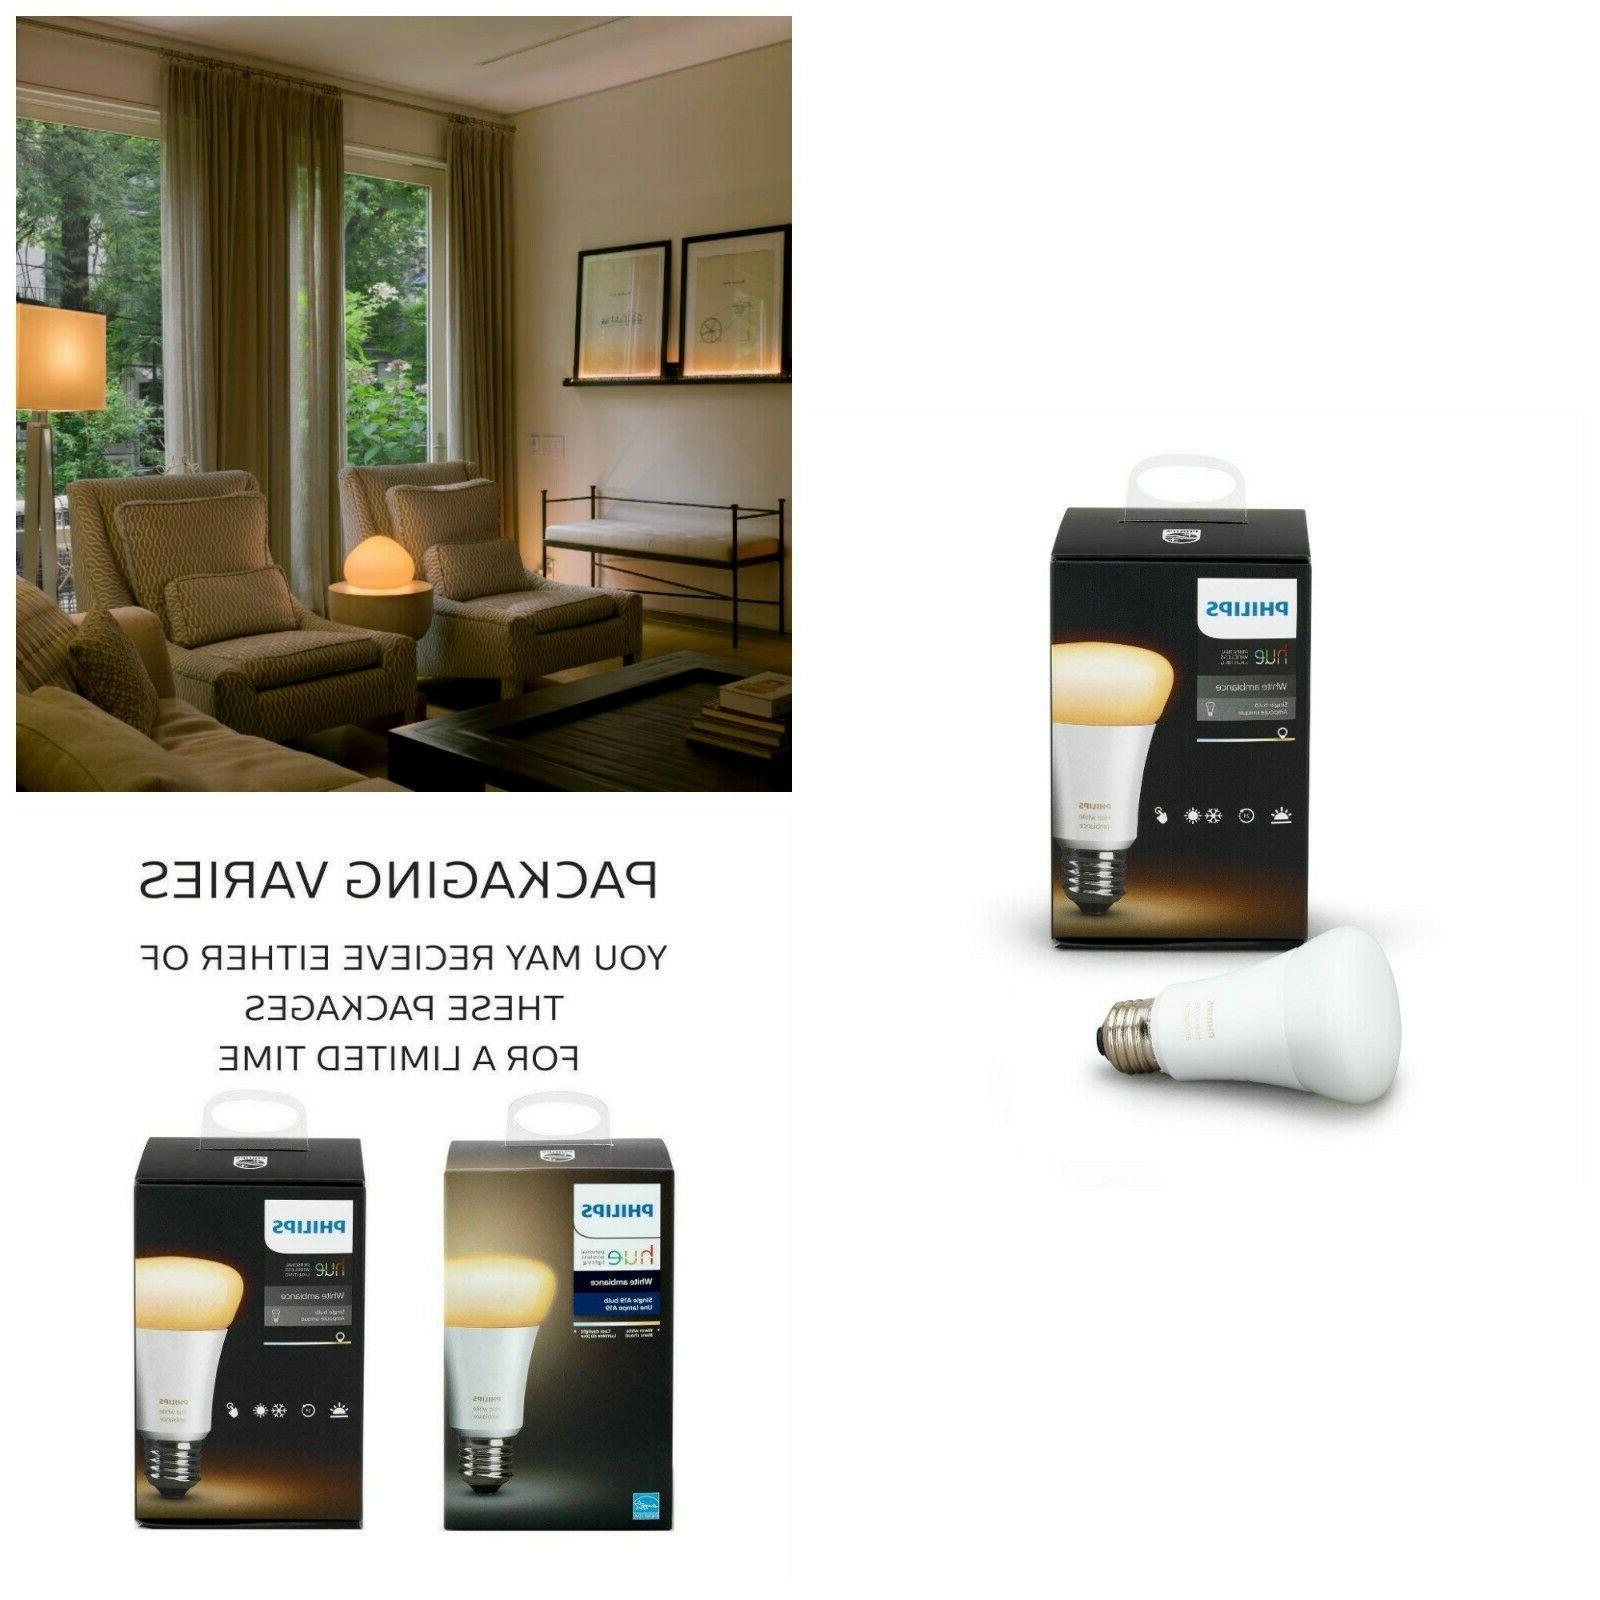 Dimmable Led Smart Light Bulb Lamp Lighting Ceiling Fans Too